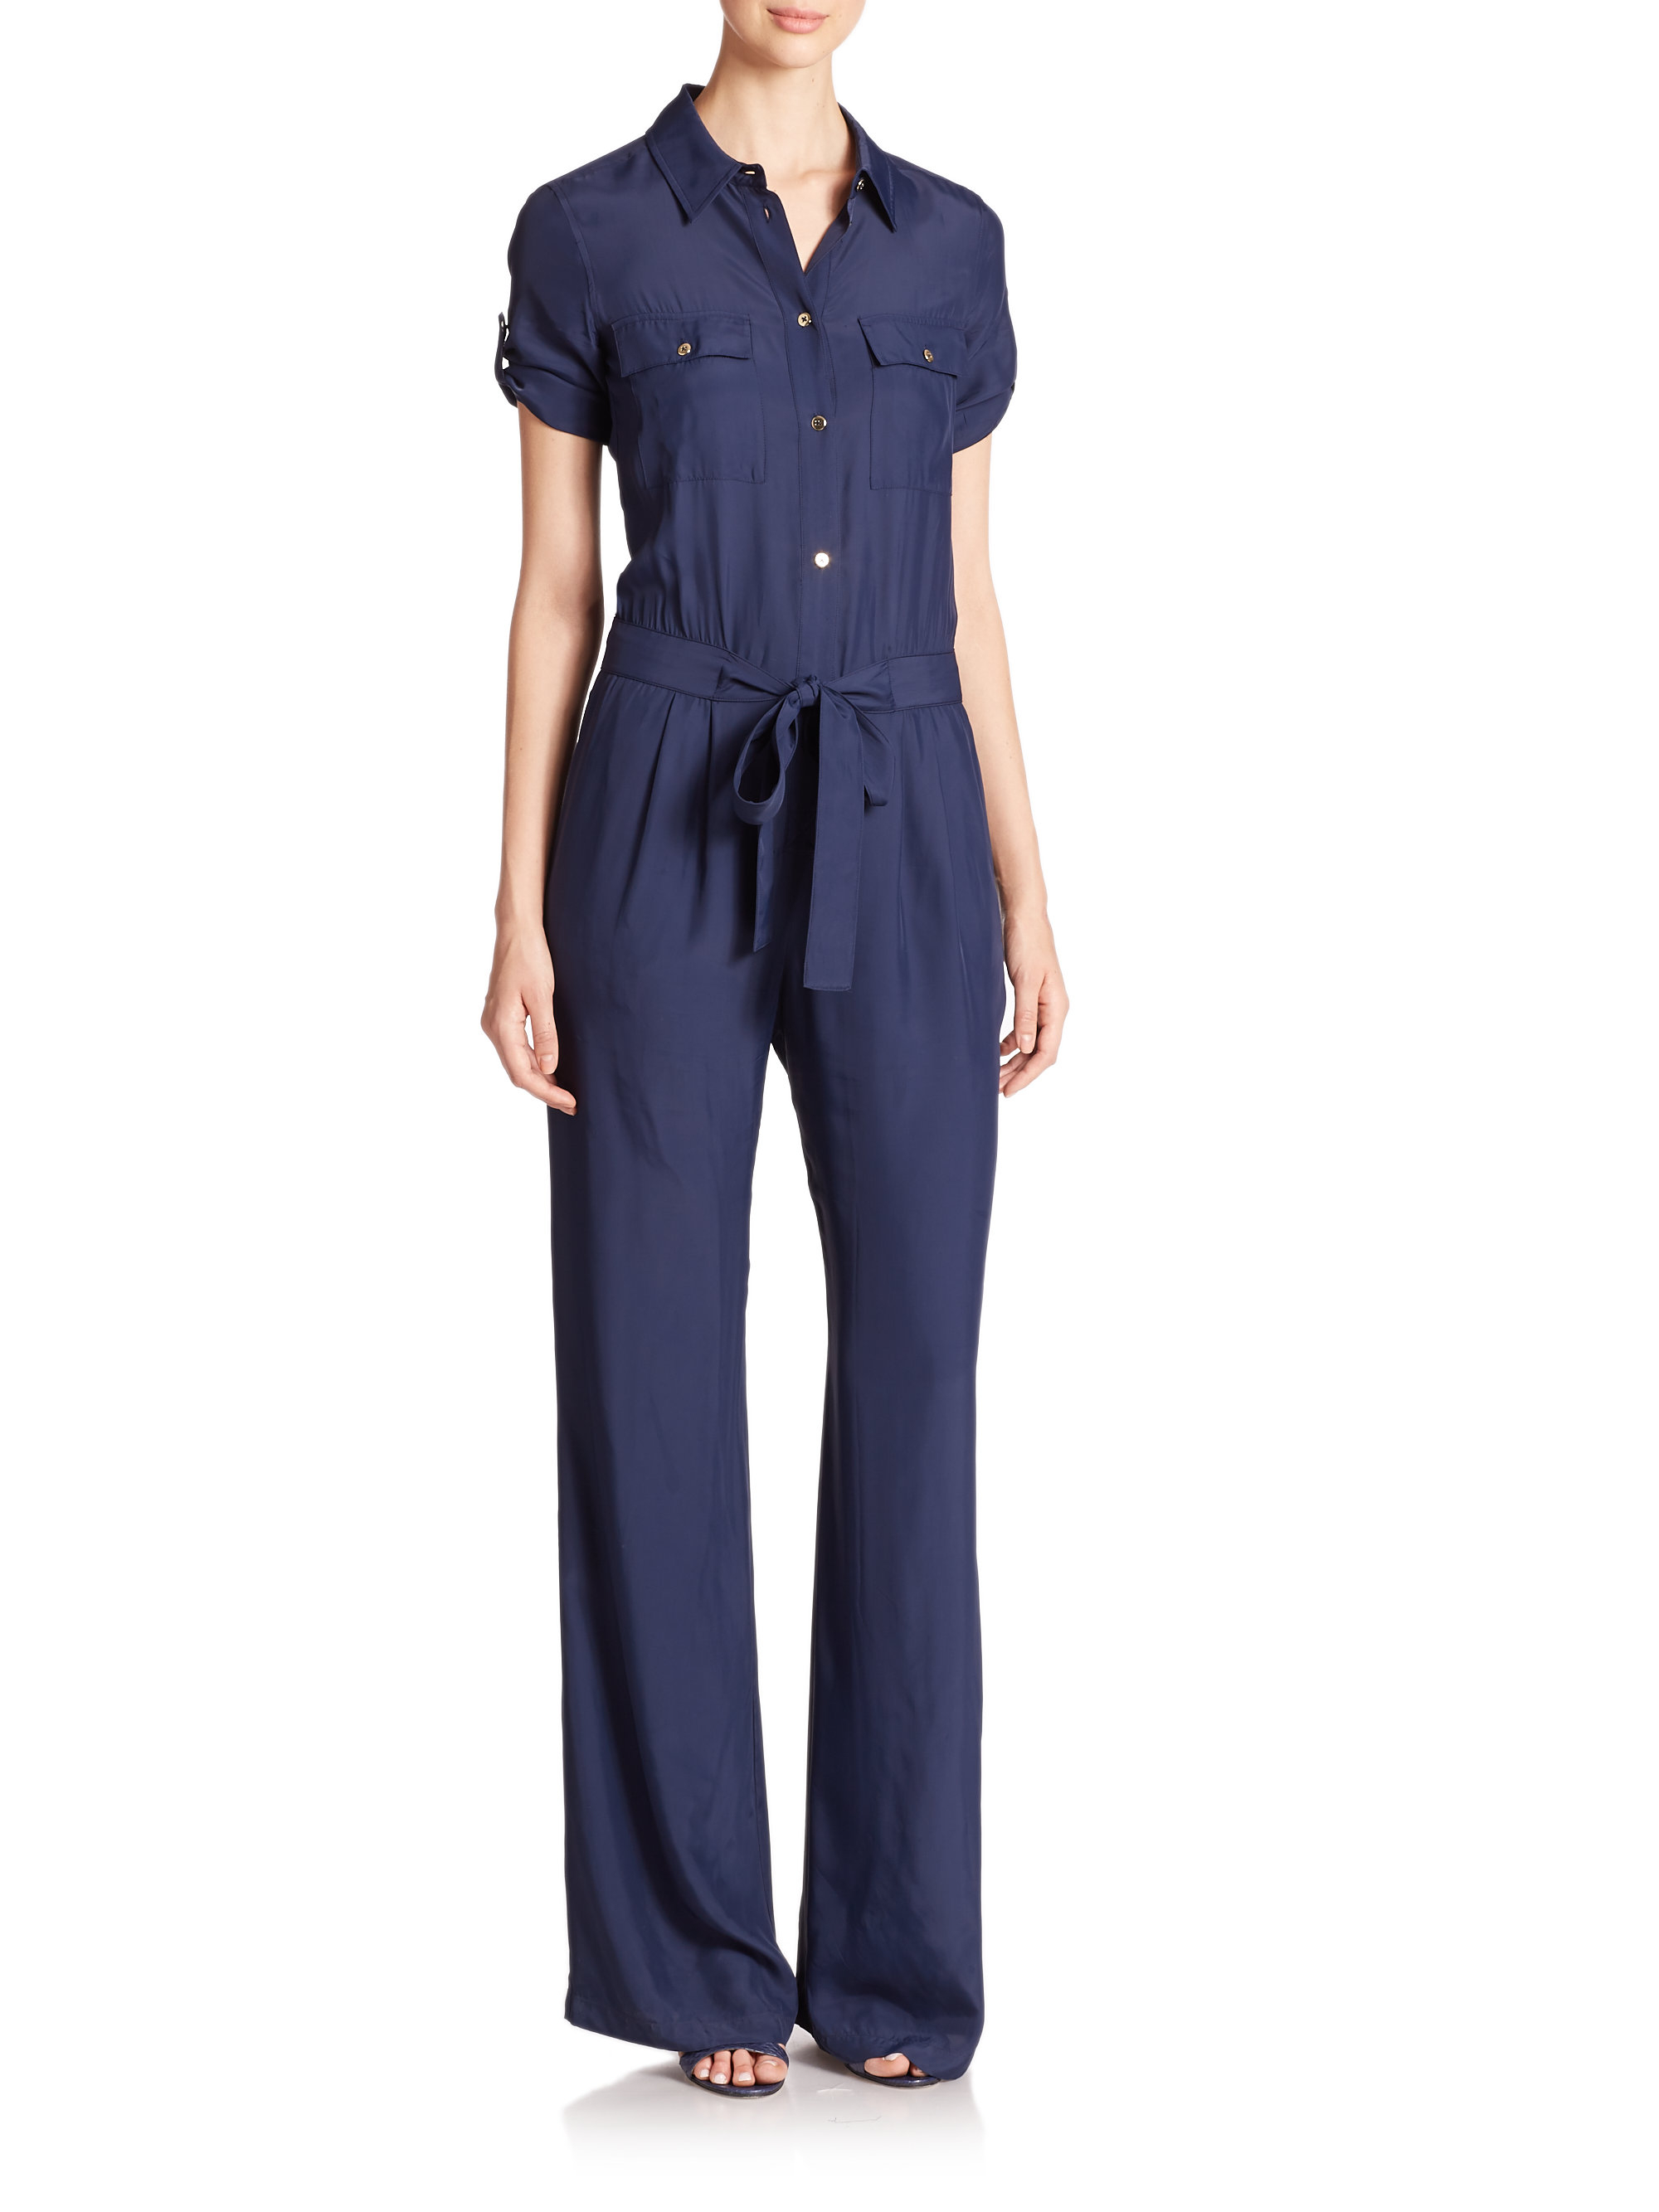 Amazing Navy Blue Jumpsuit Womens - Breeze Clothing